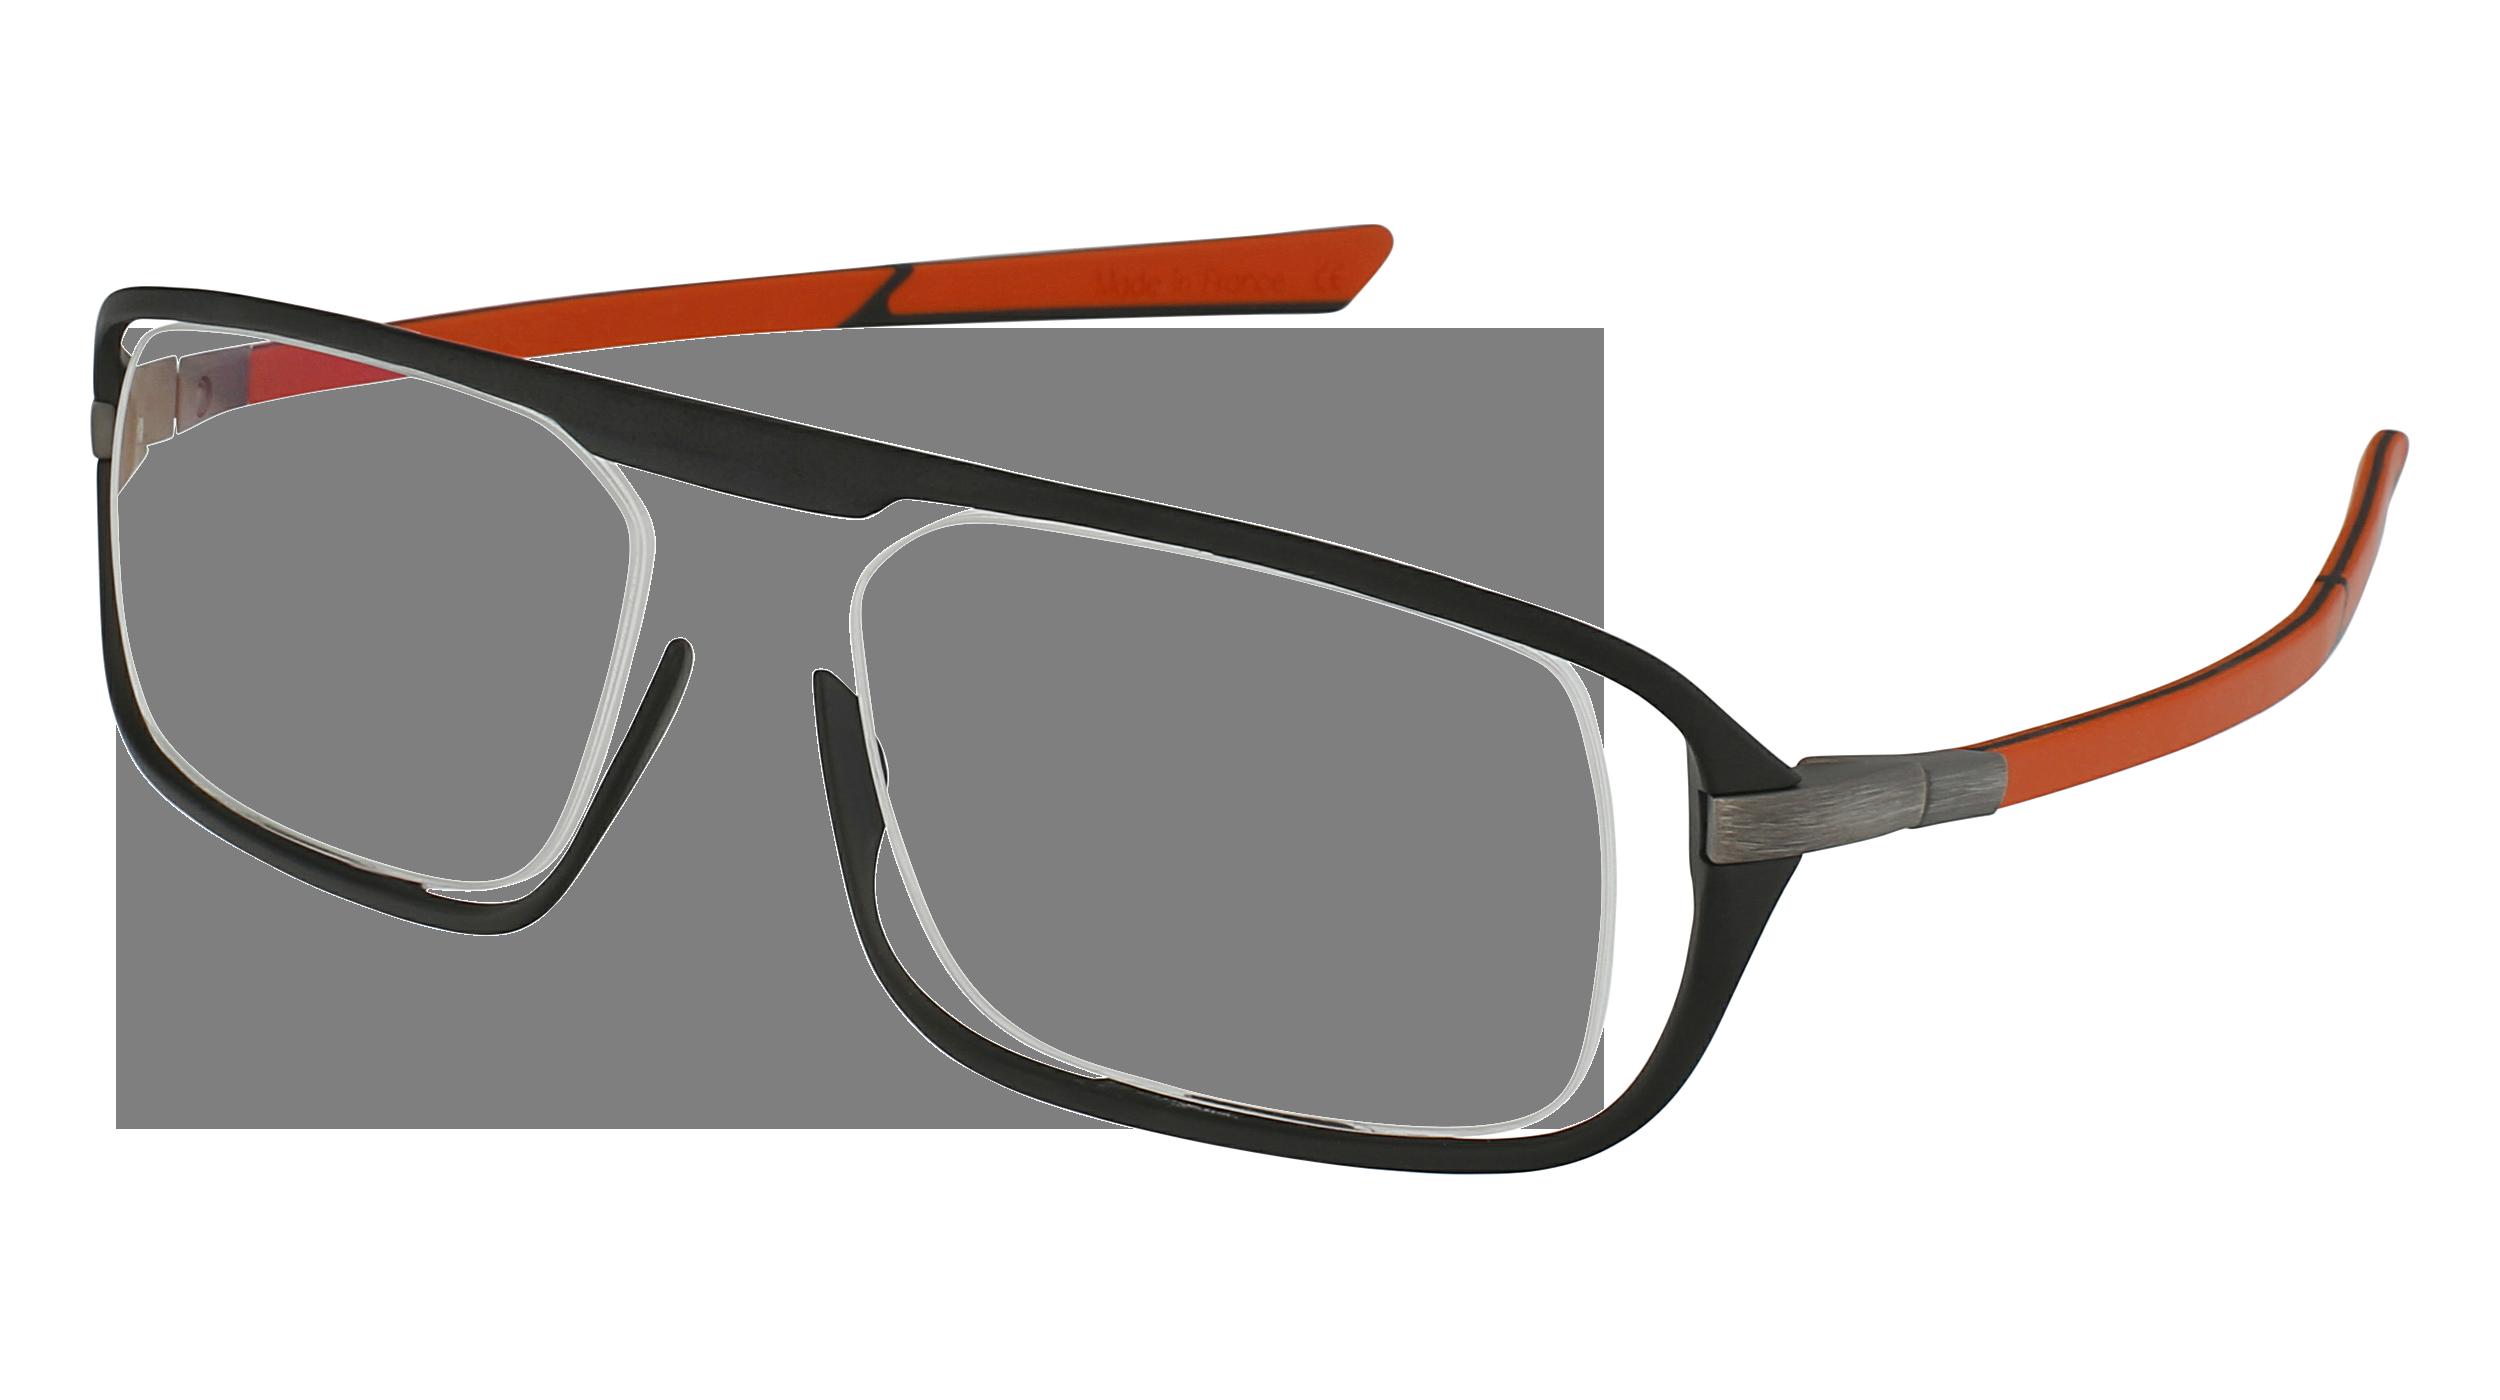 McLaren MLULTO05.C02.54